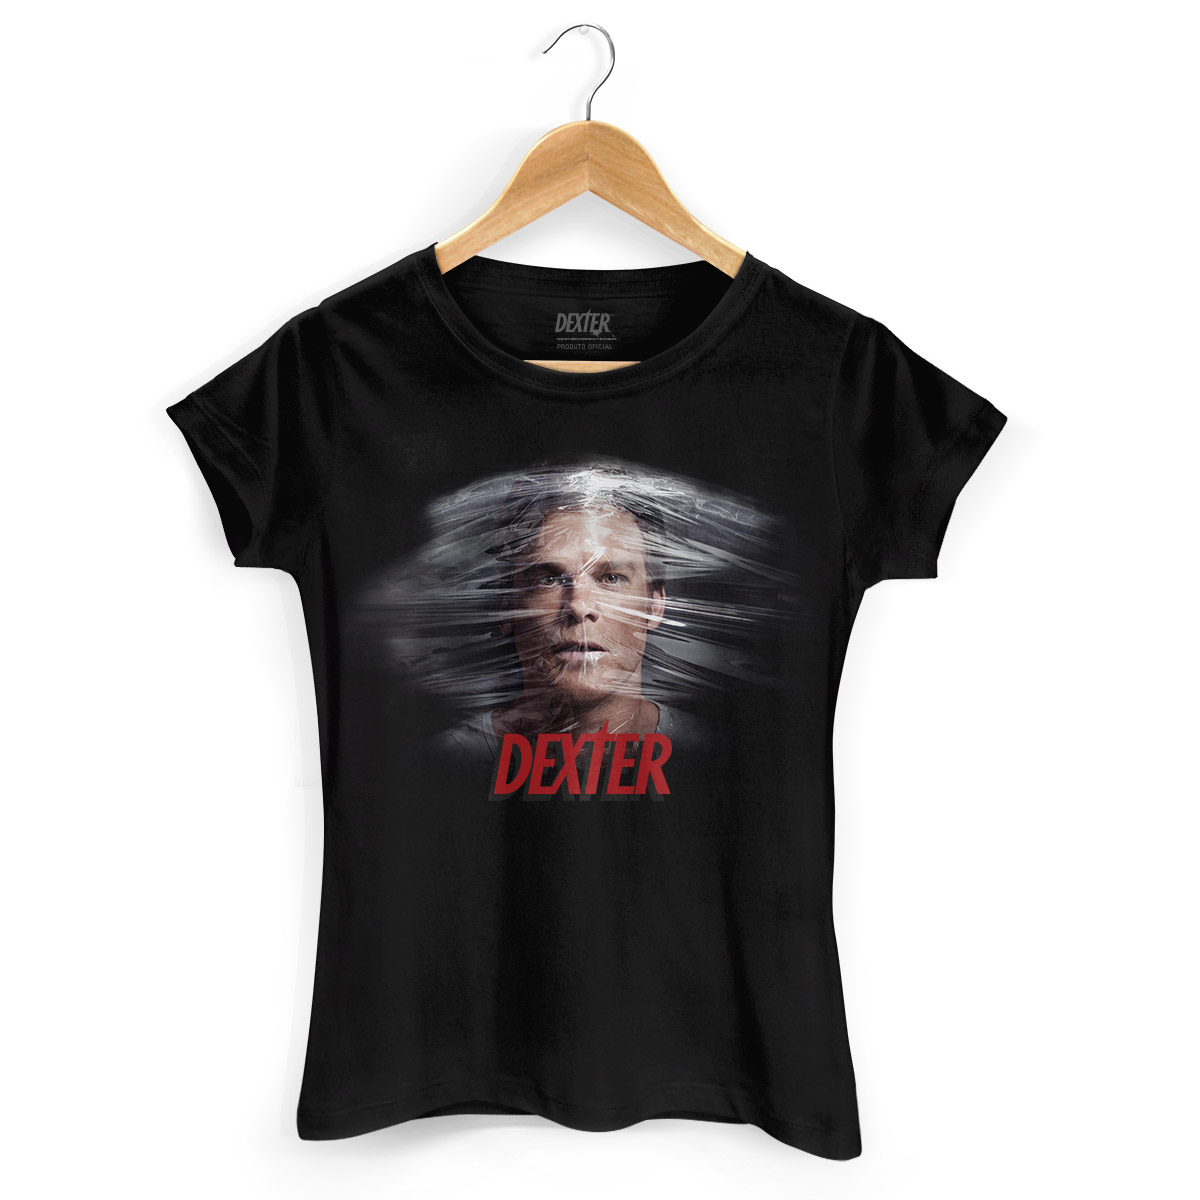 Camiseta Feminina Dexter Última Temporada